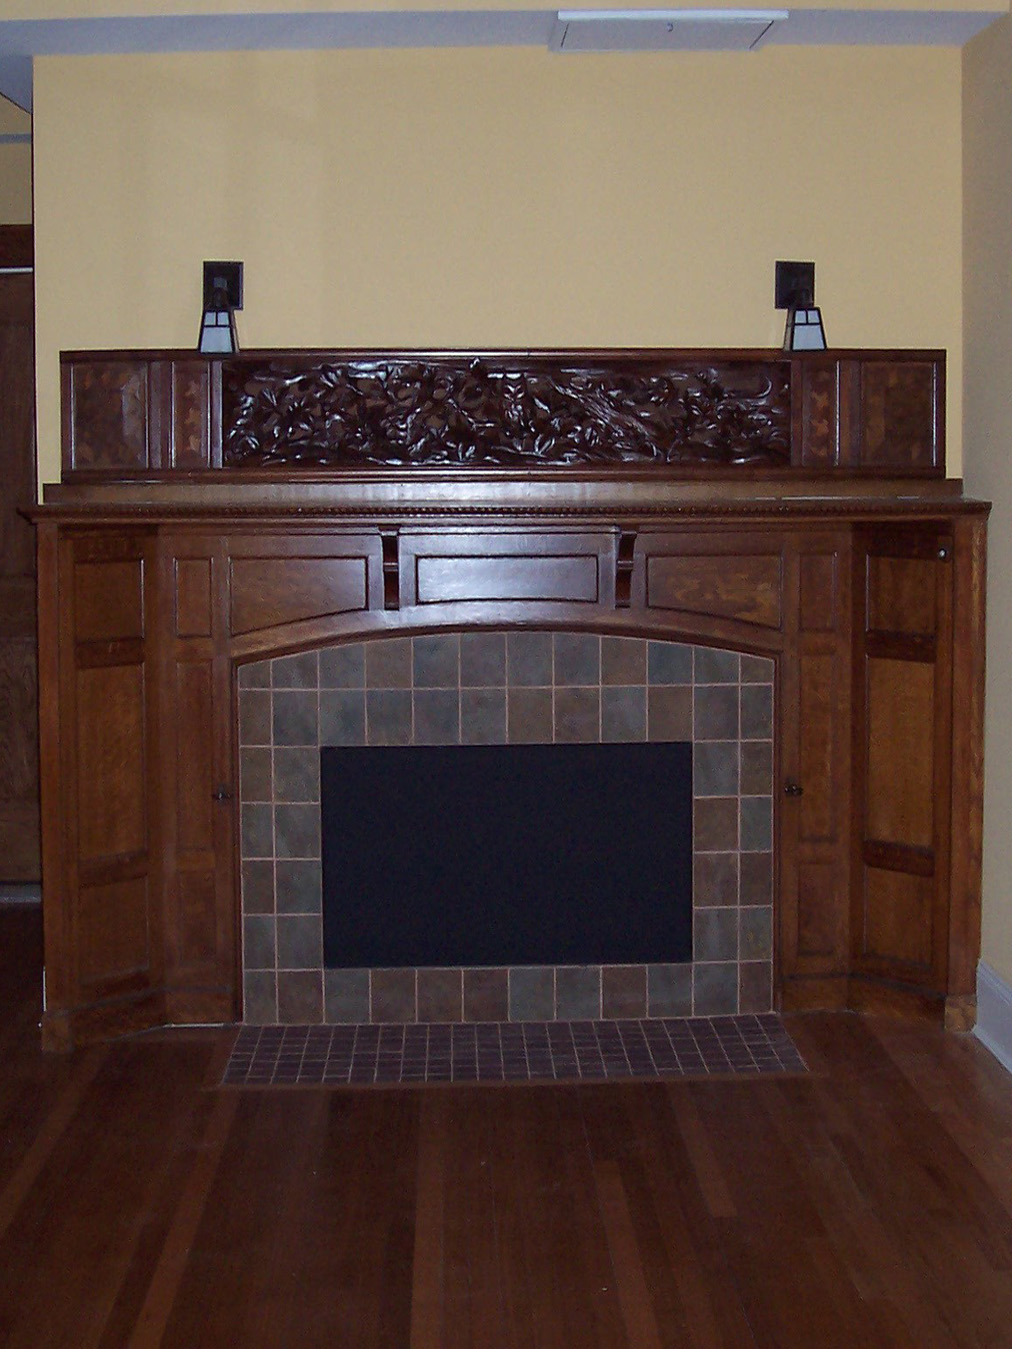 Fireplace center int pic.jpg